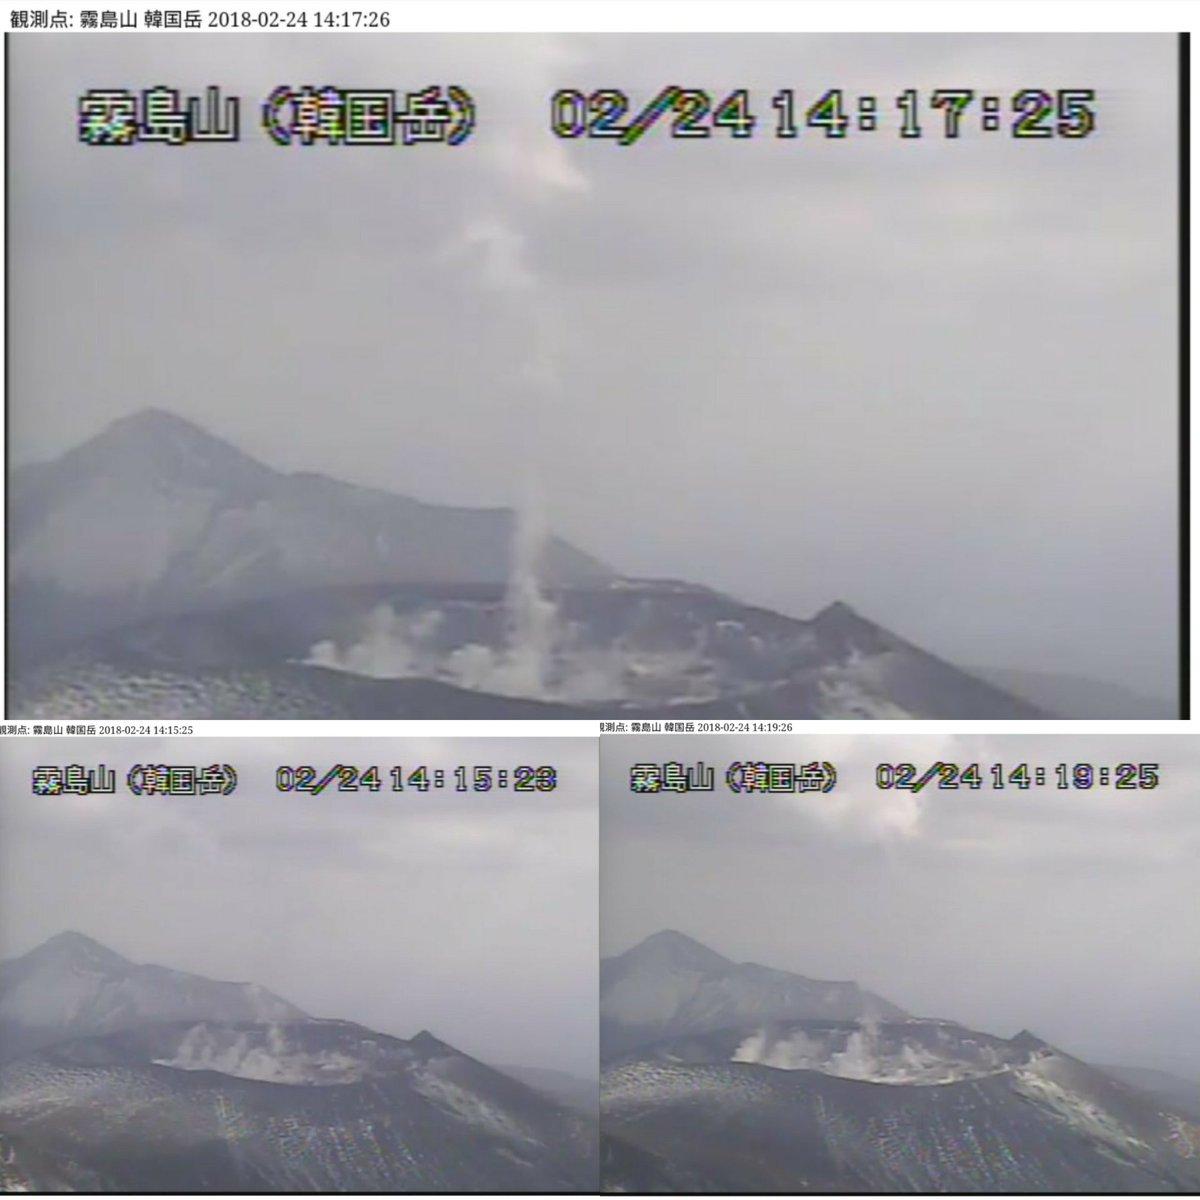 test ツイッターメディア - @tigers_1964 失礼します。  新燃岳の噴気が高く登ったように見えますが、ガス抜きですかね? https://t.co/IIeltPMwXI